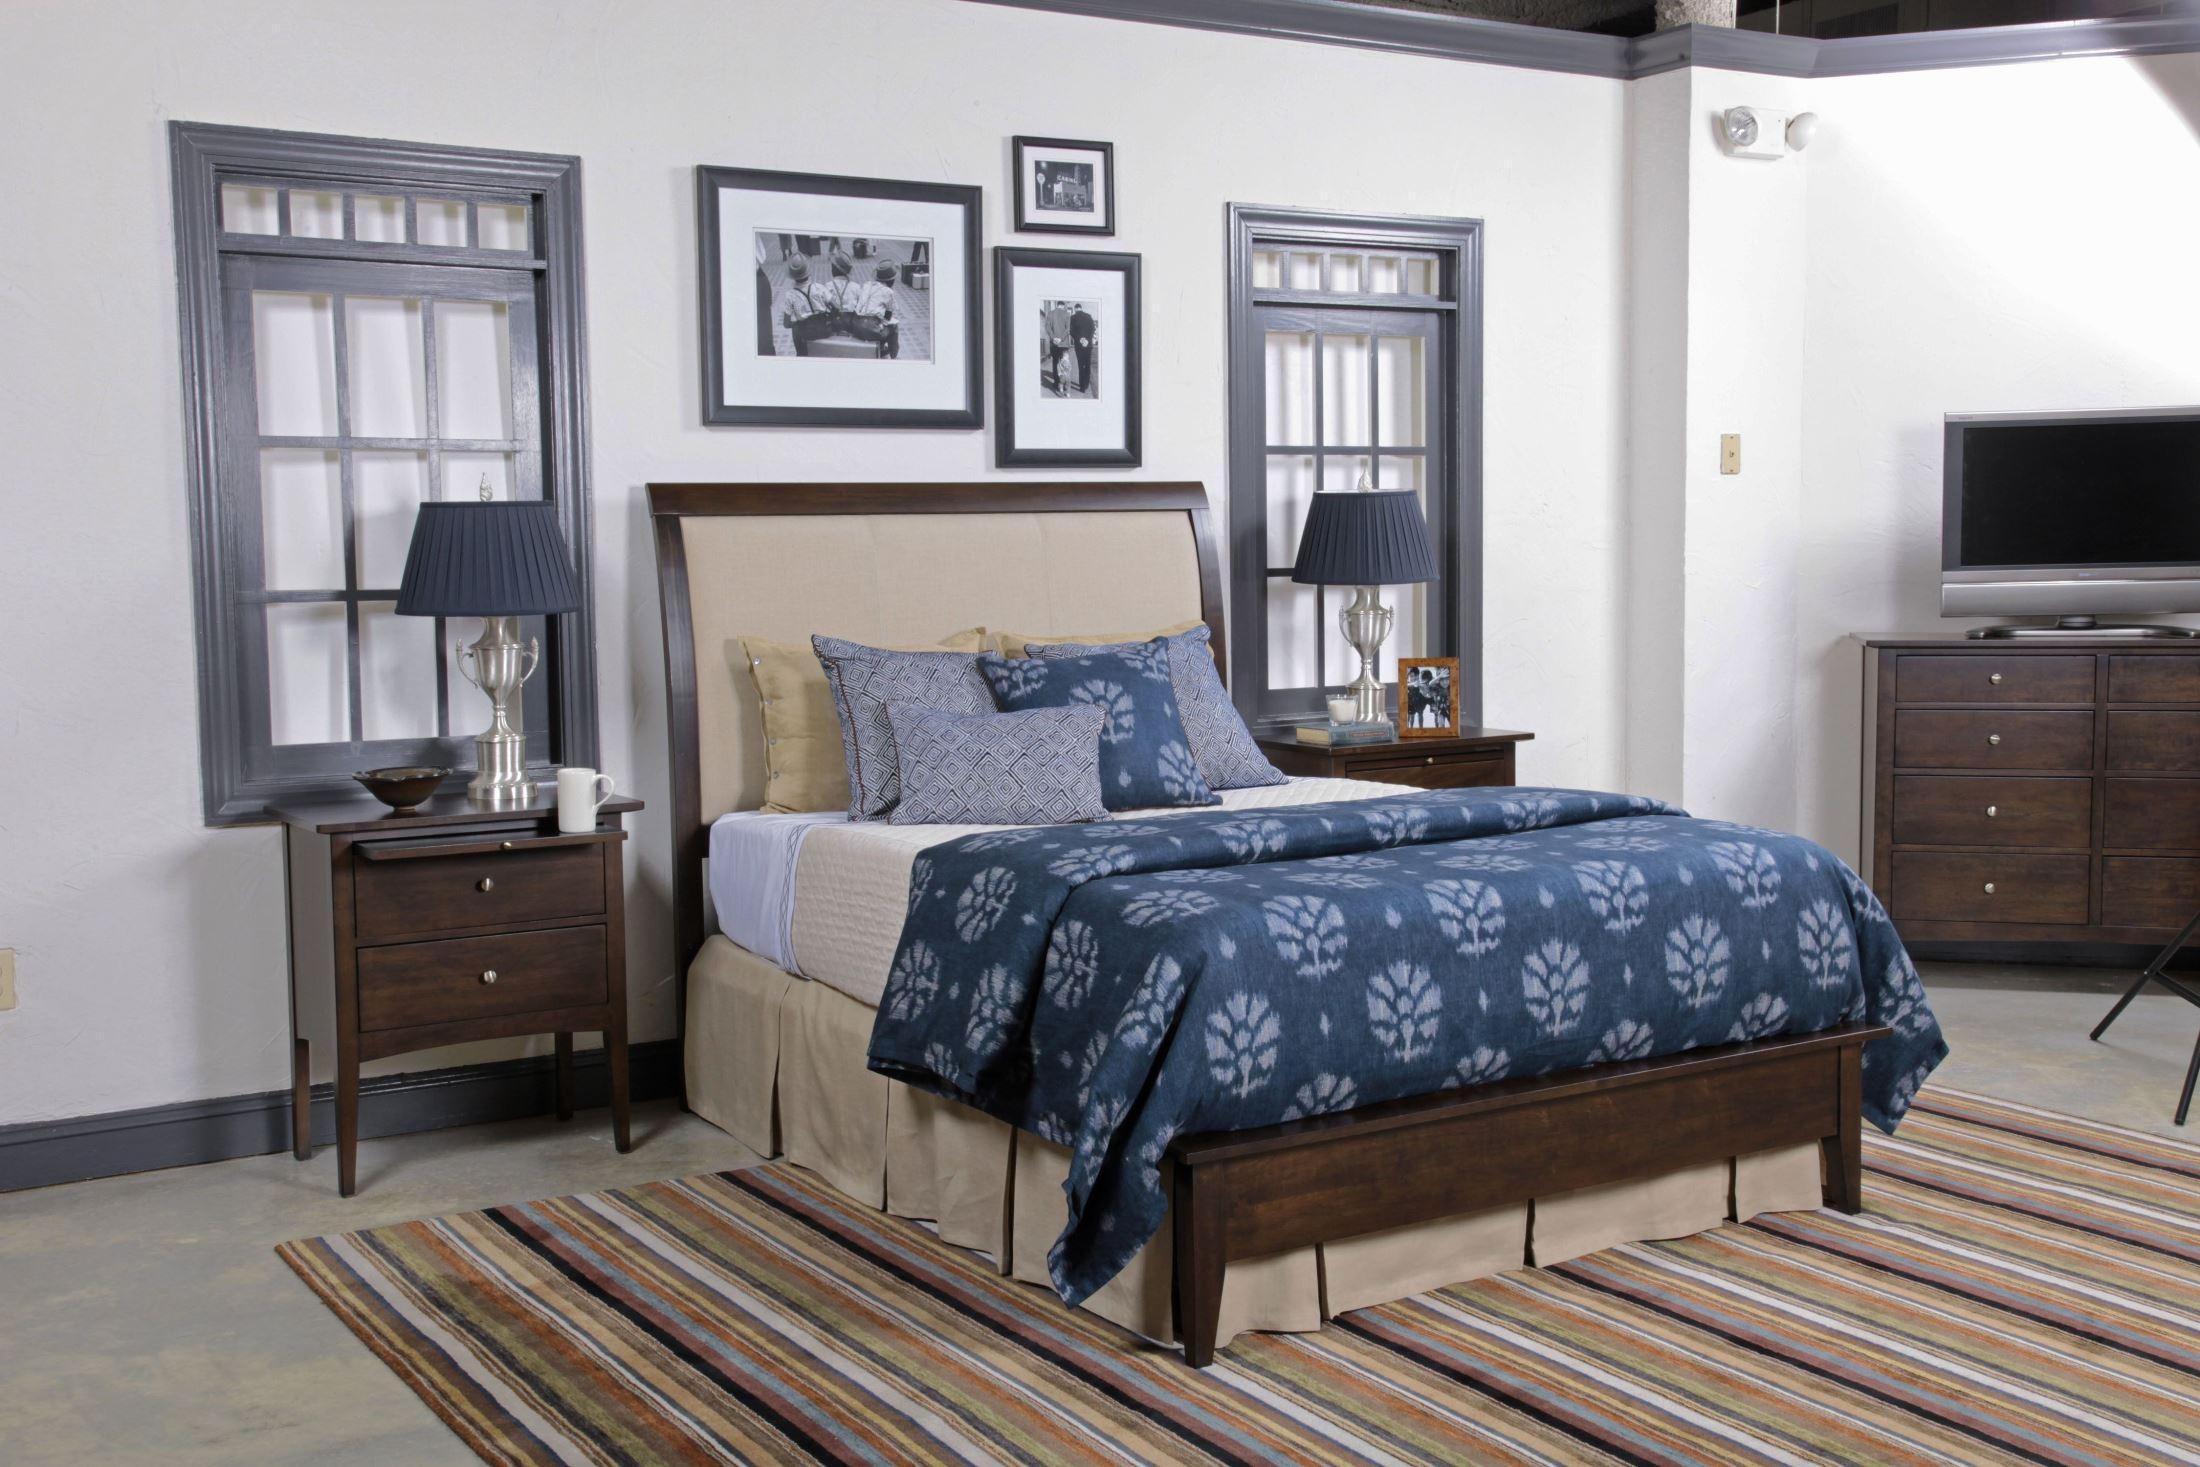 Gatherings Molasses Meridian Bedroom Set From Kincaid 44 2530p Coleman Furniture